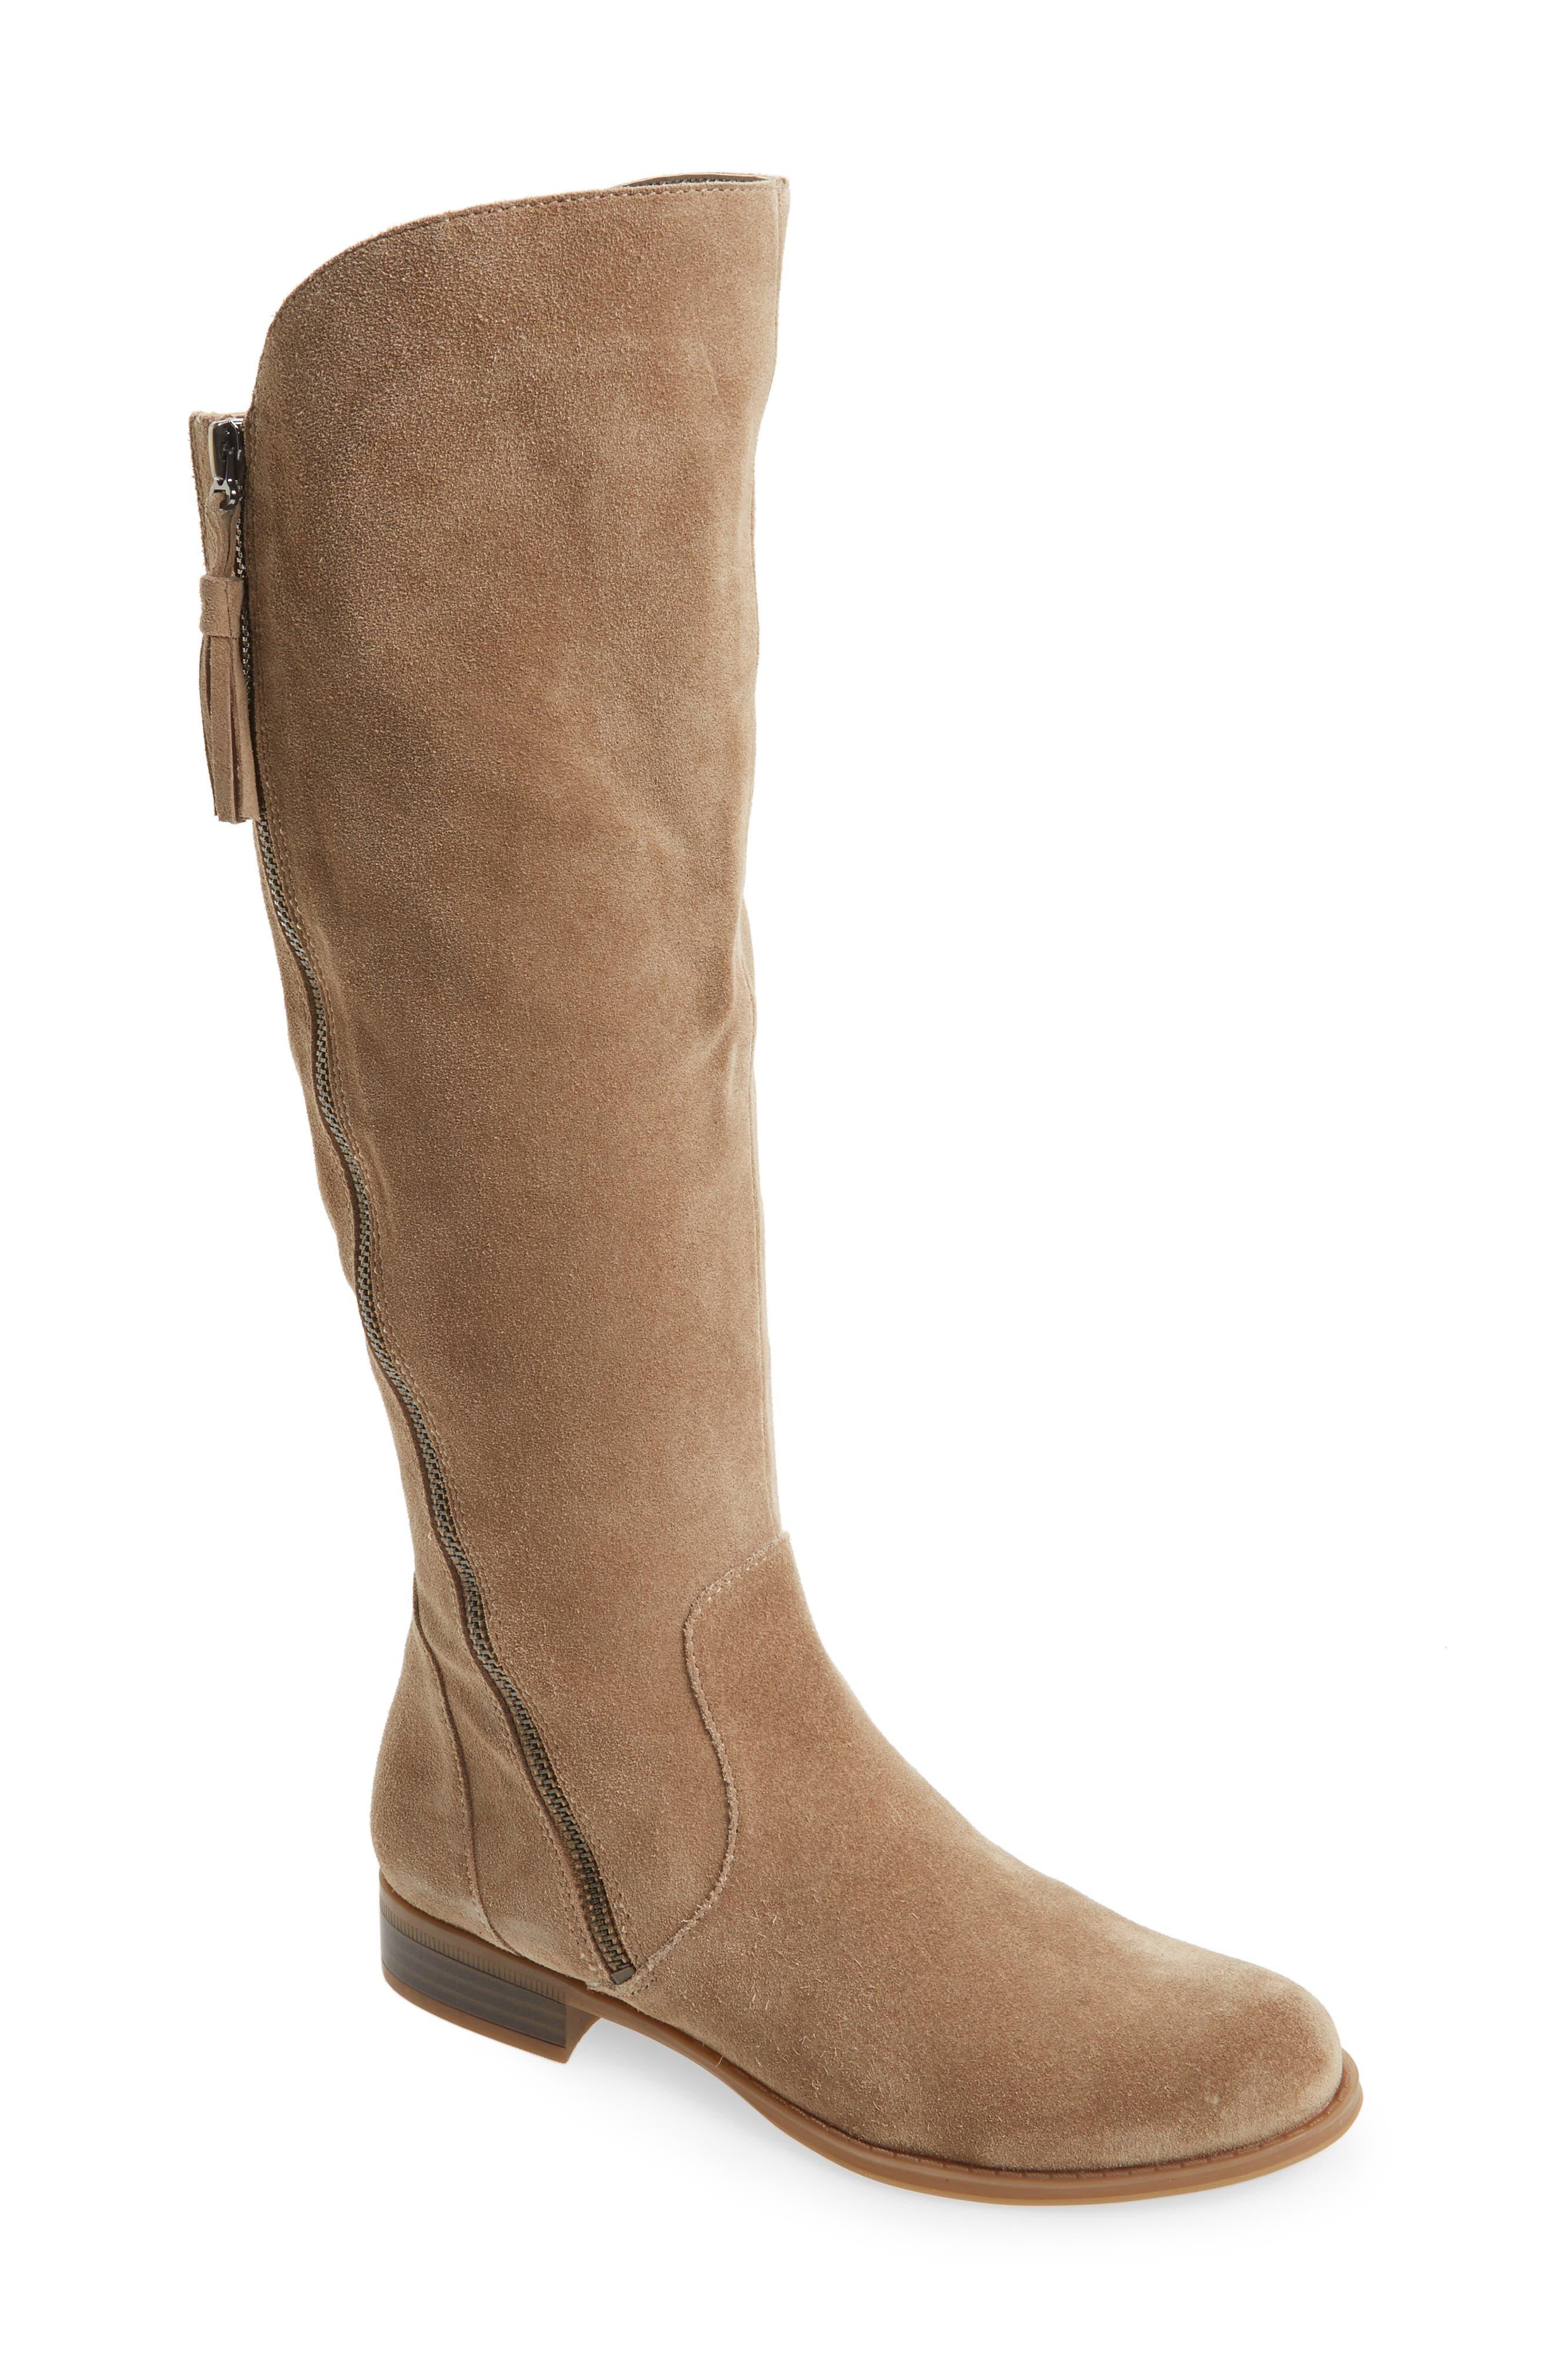 Alternate Image 1 Selected - Naturalizer Jinnie Tall Boot (Women) (Regular & Wide Calf)